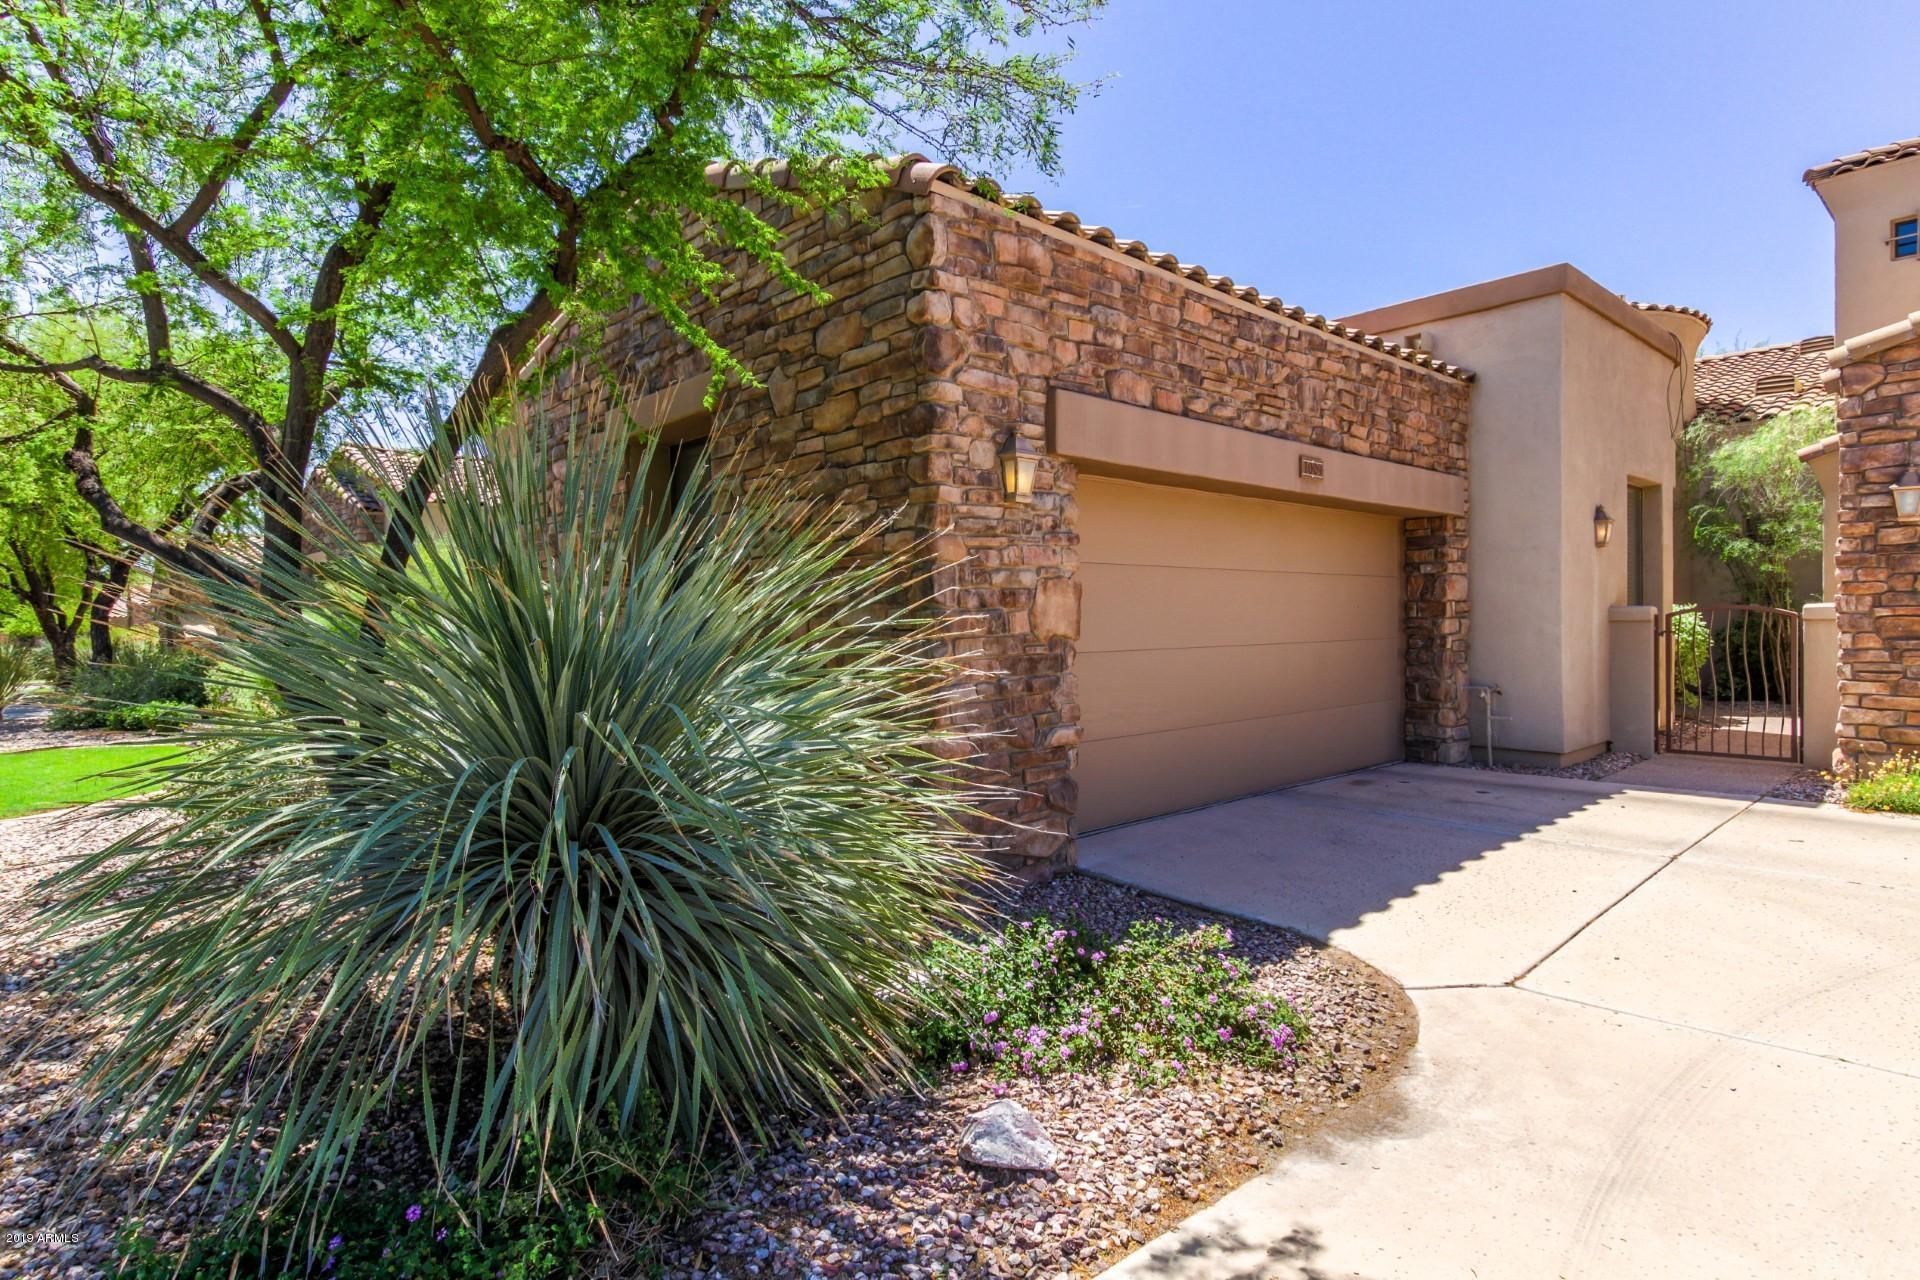 7445 E EAGLE CREST Drive Unit 1009, Mesa AZ 85207